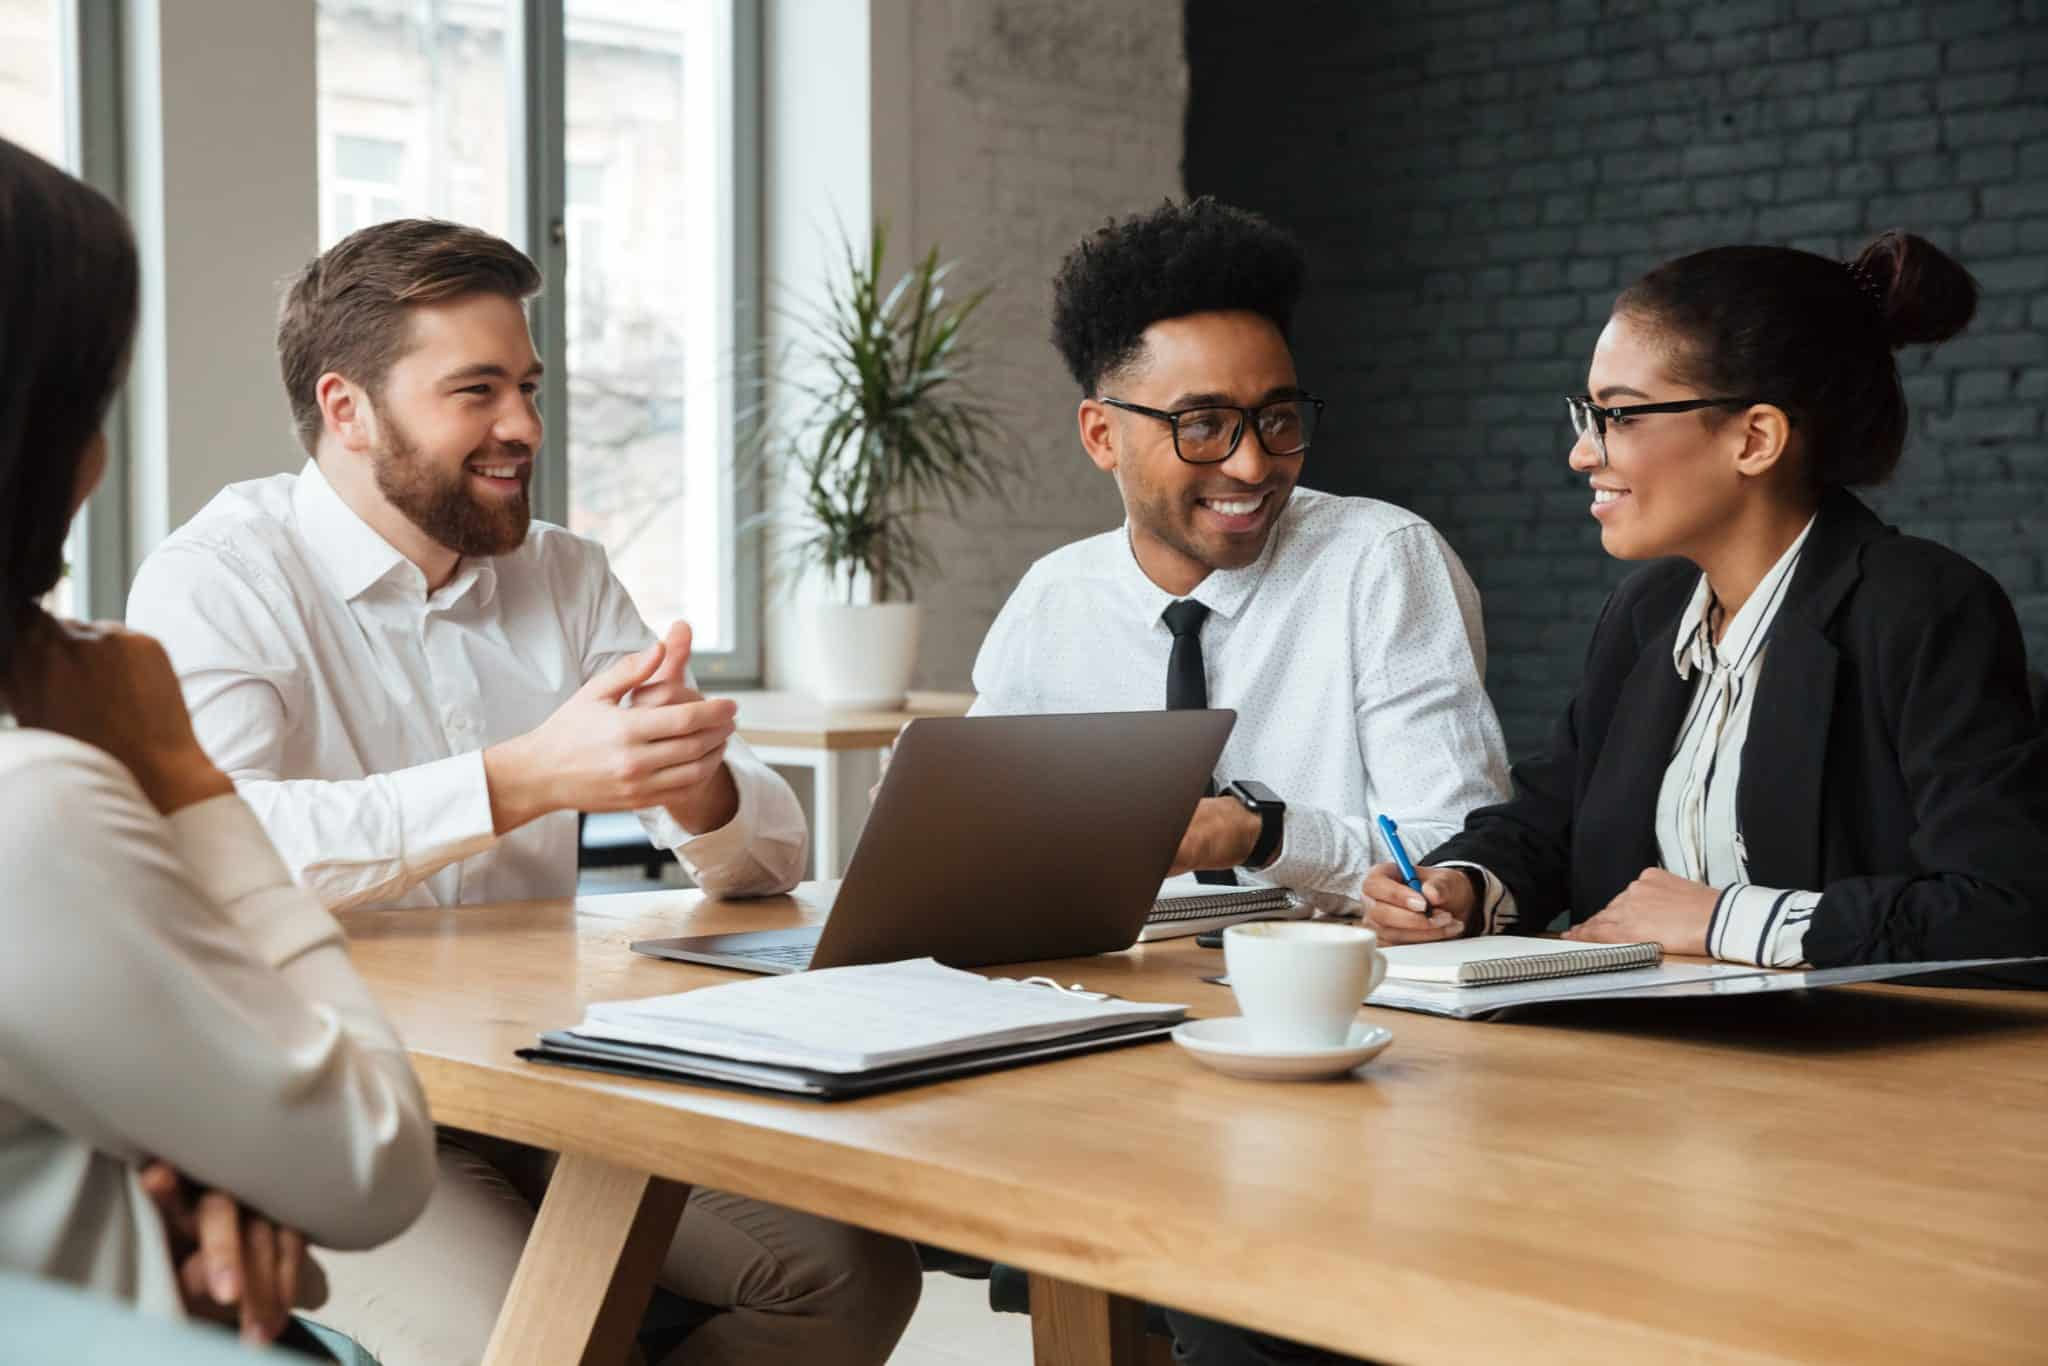 Kurs Datenschutz im HR-Management